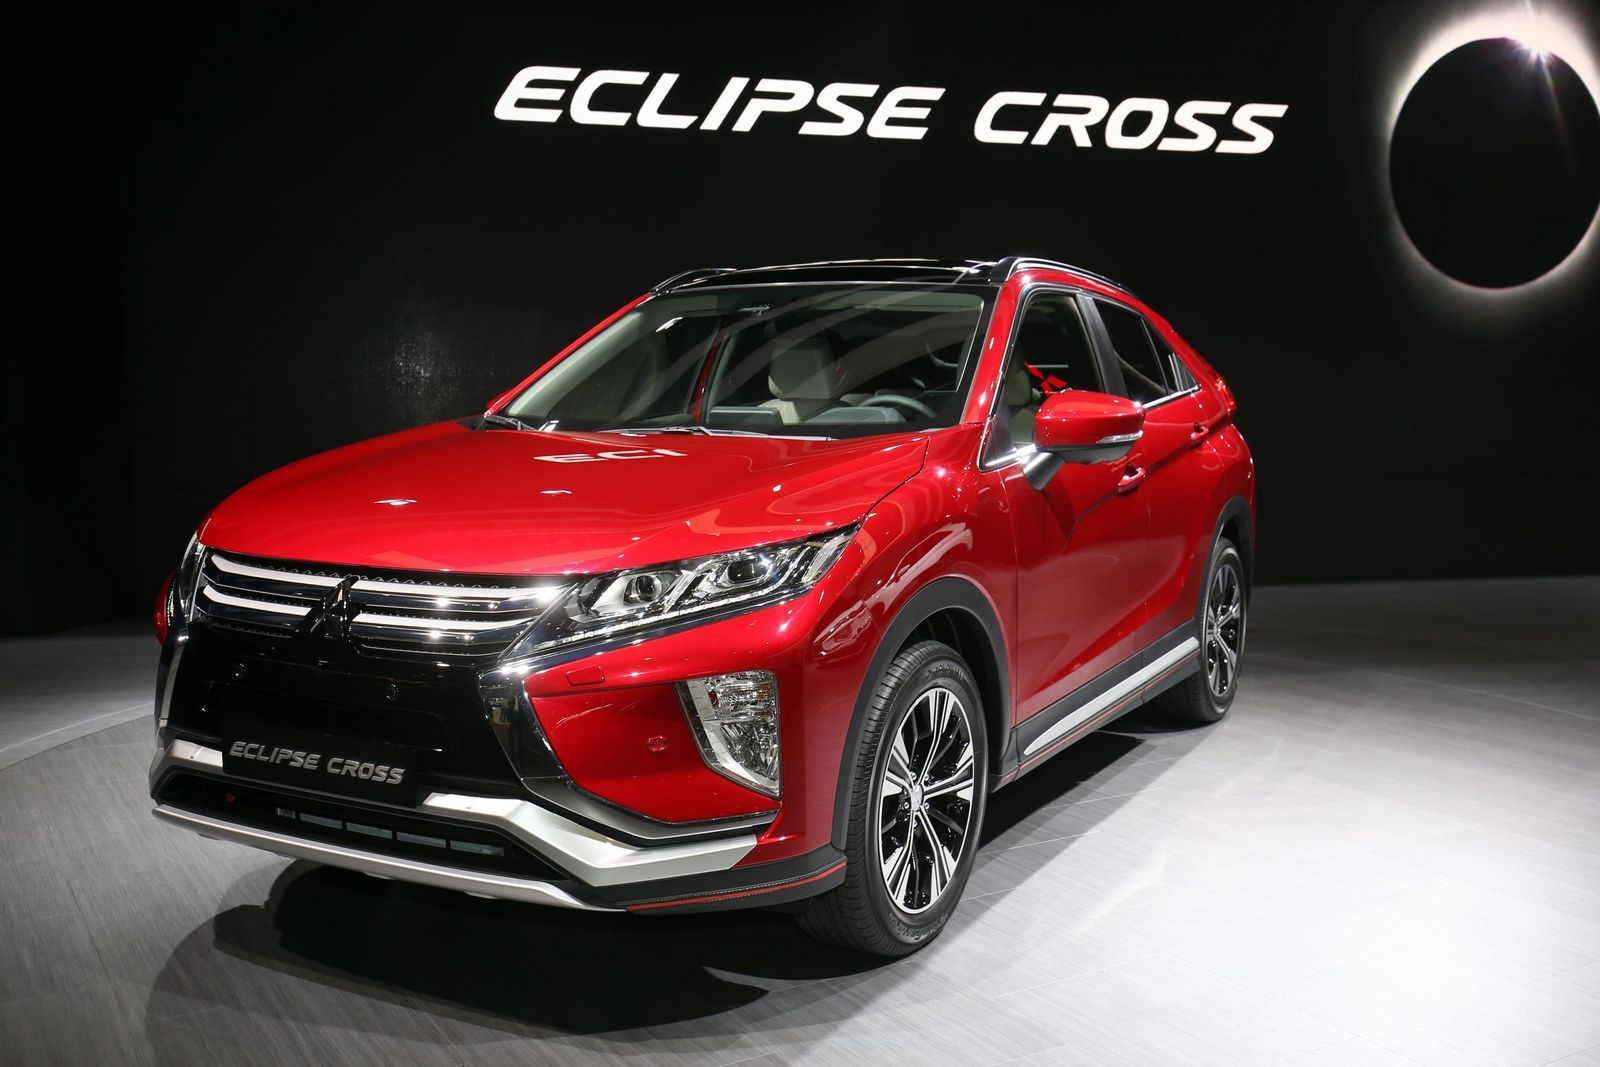 New Mitsubishi Eclipse Cross Debuts At Geneva Motor Show Mitsubishi Eclipse Mitsubishi Geneva Motor Show